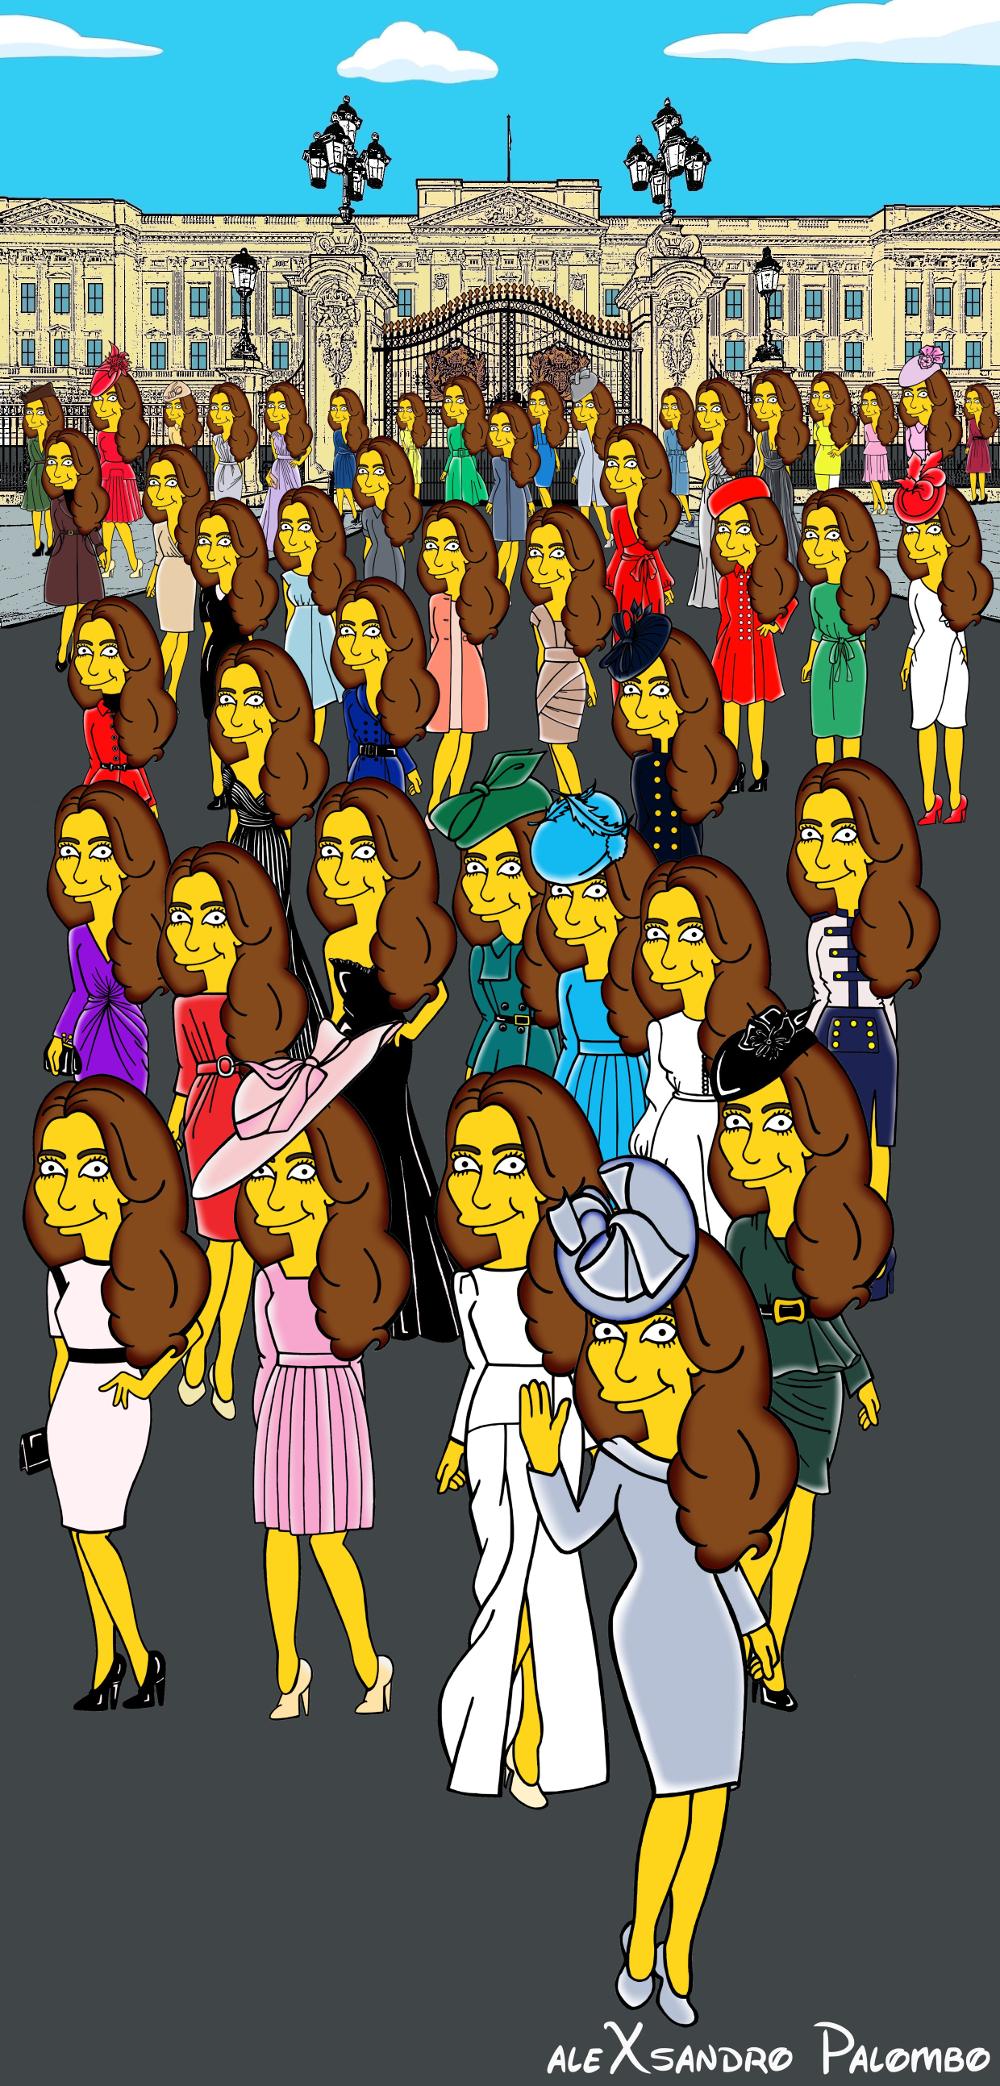 Princess Kate Middleton  Duchess of Cambridge and Queen Elizabeth Simpsonized The Simpsons Buckingham Palace  Art Cartoon Illustration Style Best Dresses Look Fashion Royal Icon Artist aleXsandro Palombo Humor Chic Web 2